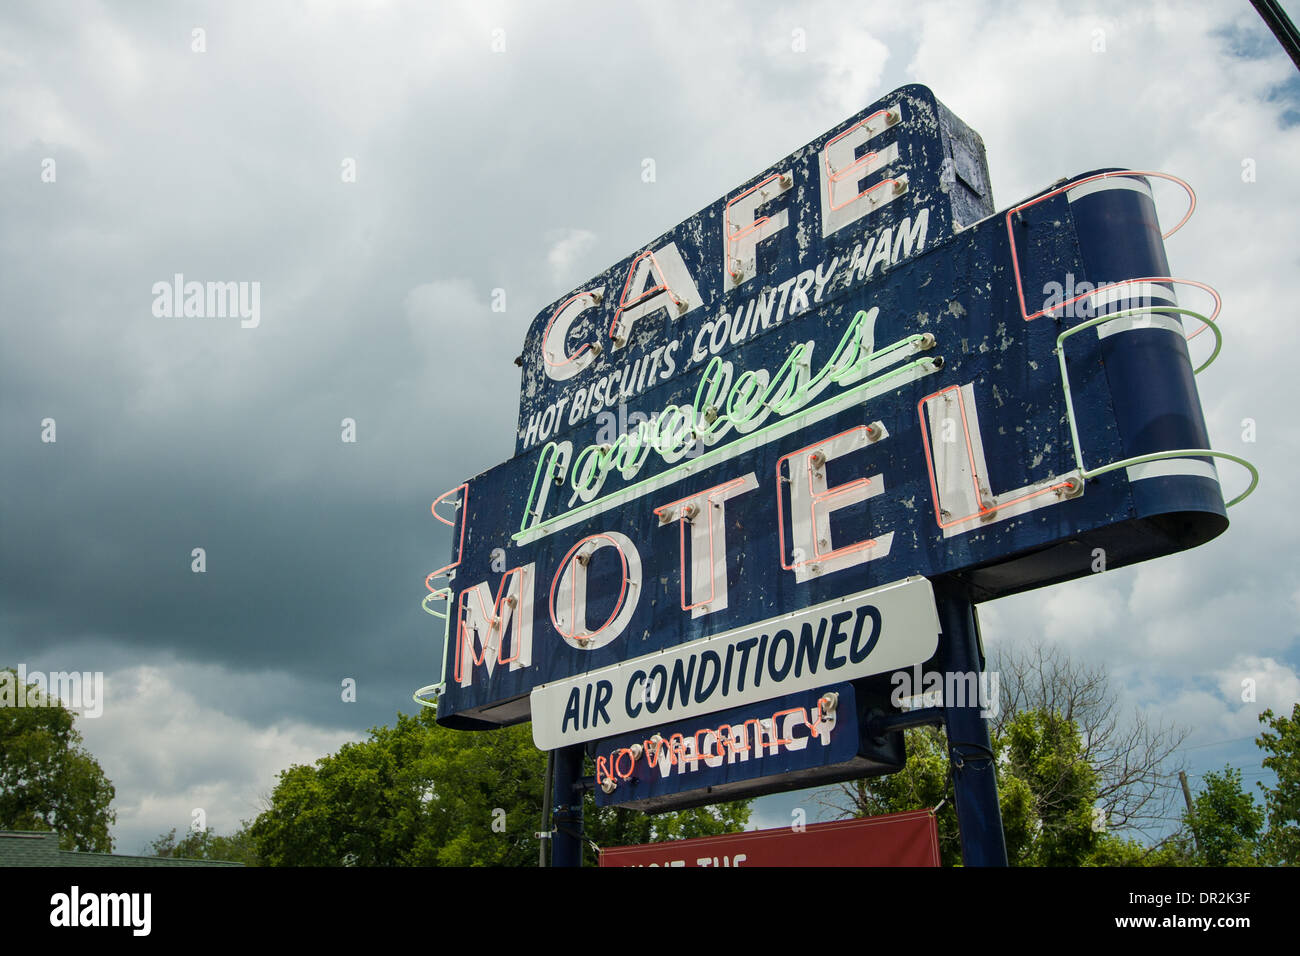 Loveless Café, Nashville, Tennessee - Stock Image